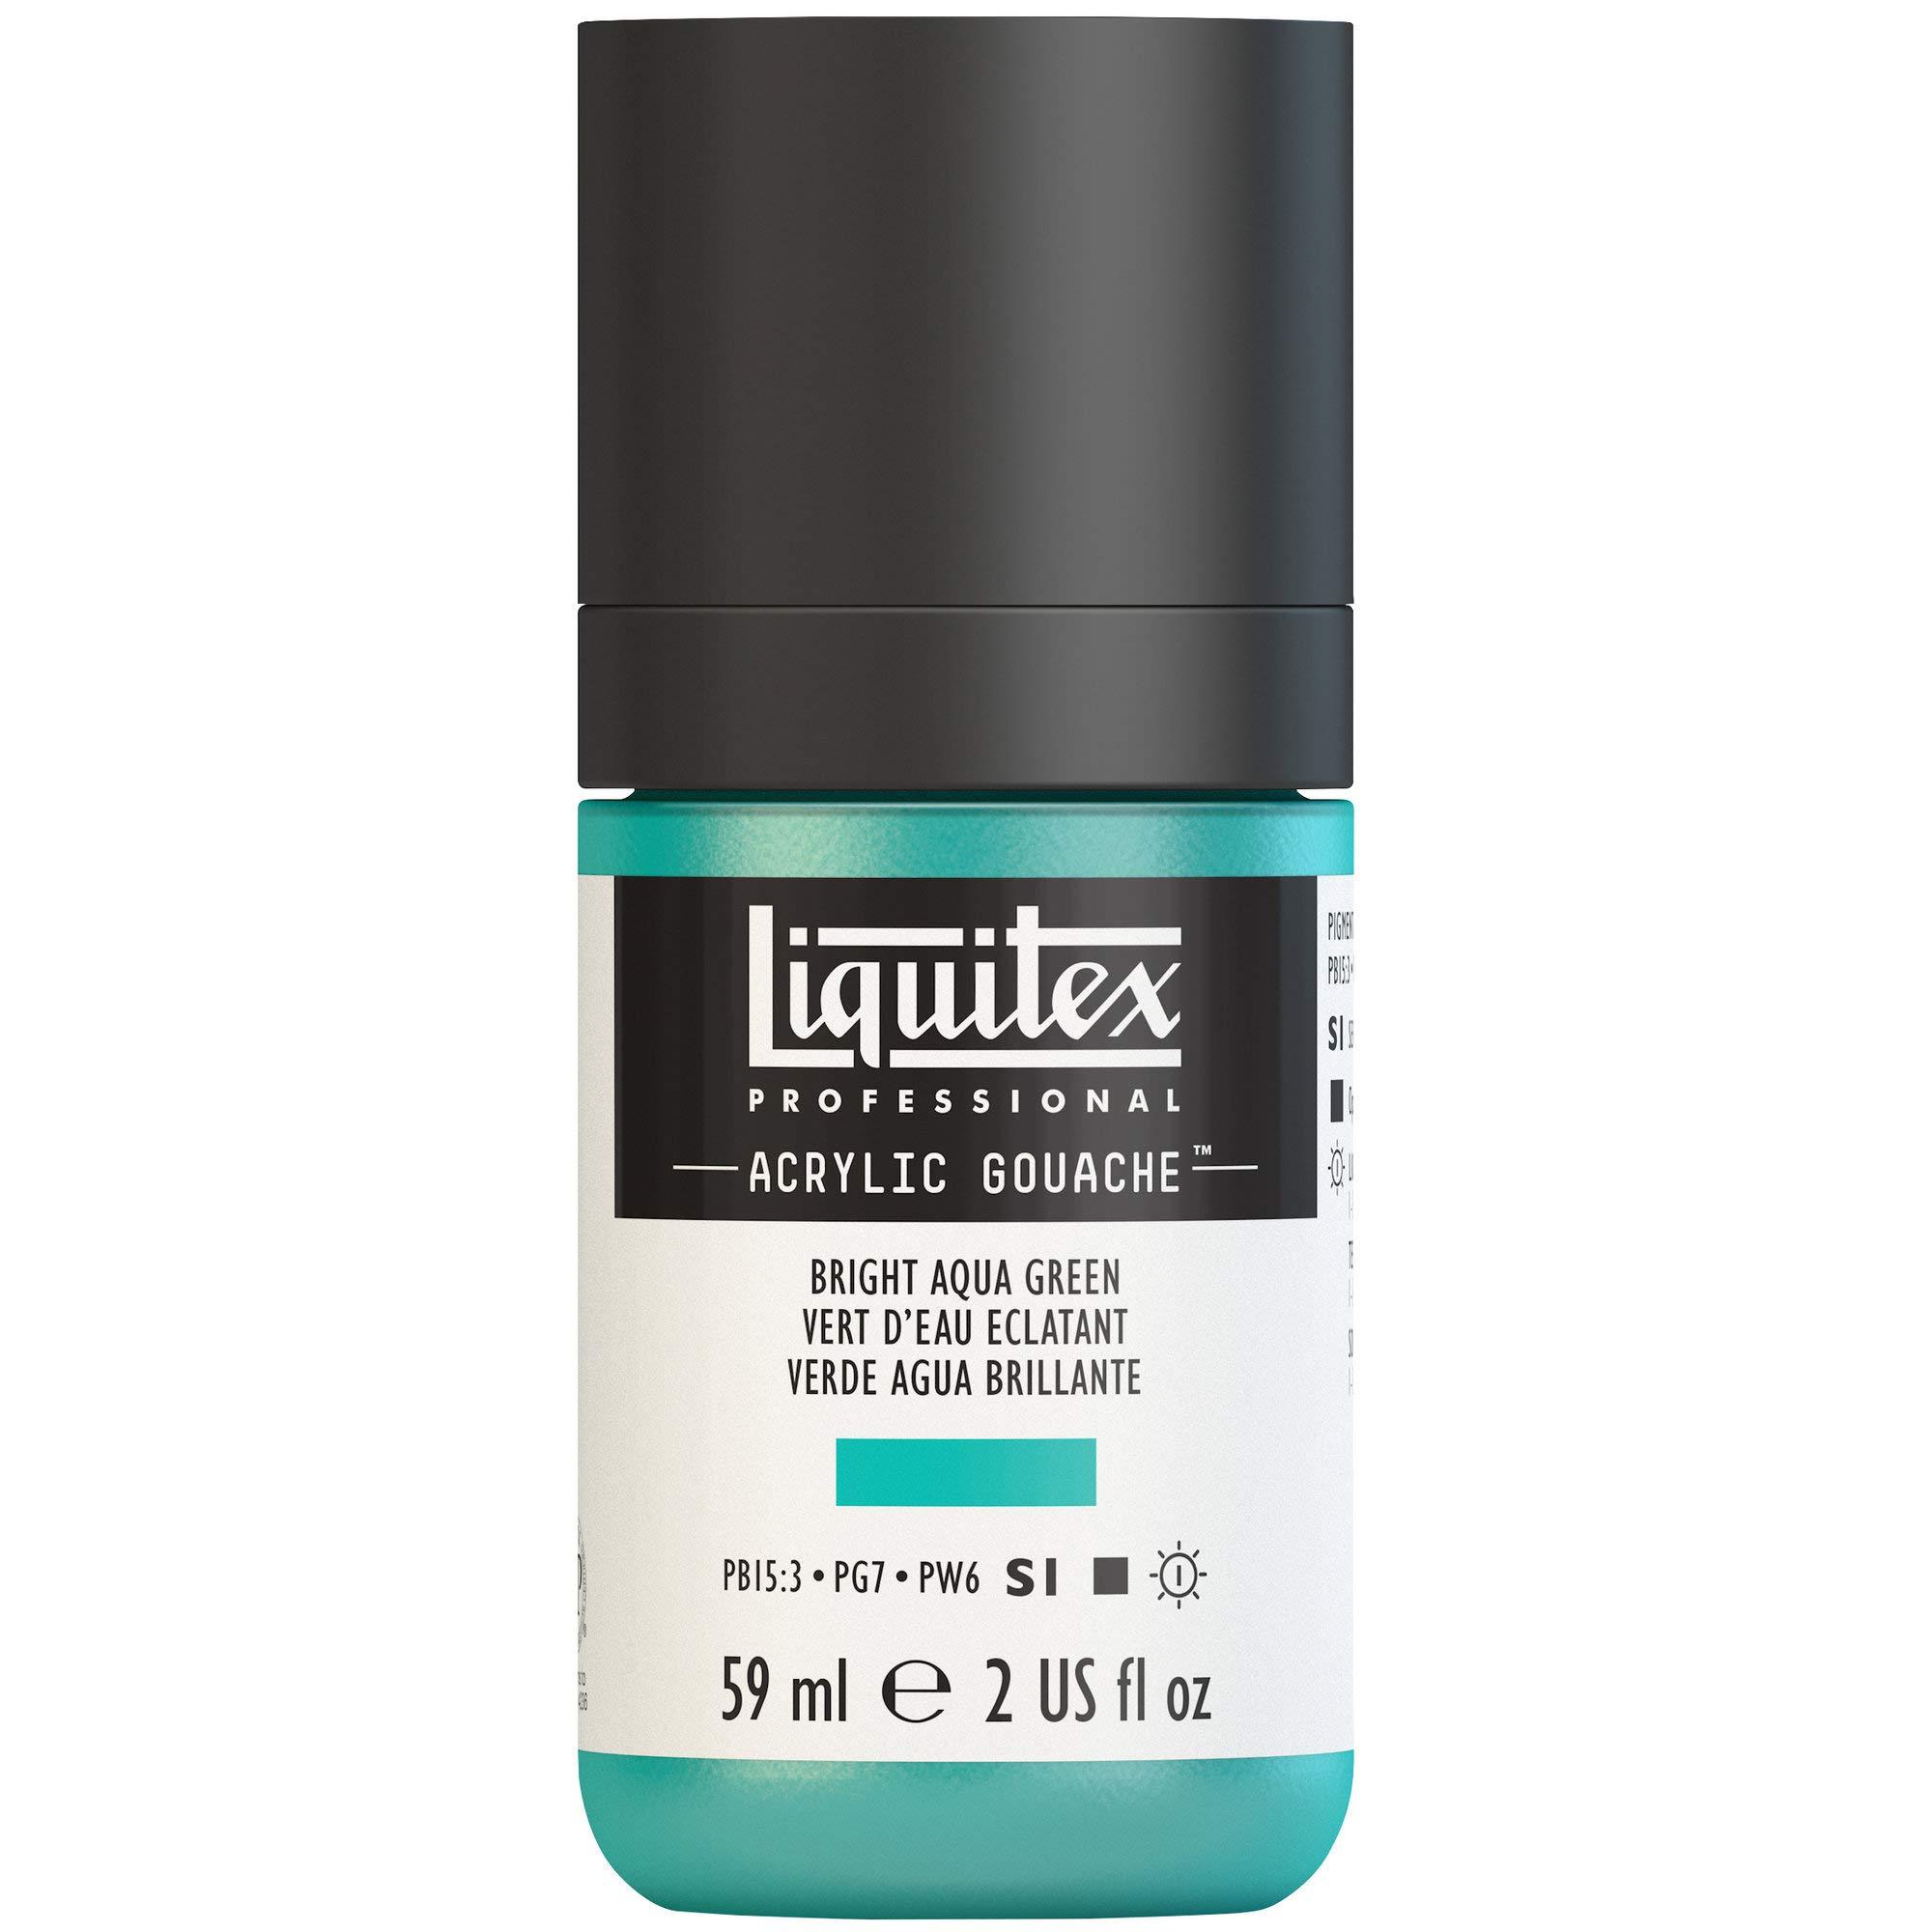 Liquitex Professional Acrylic Gouache 2-oz bottle, Bright Aqua Green